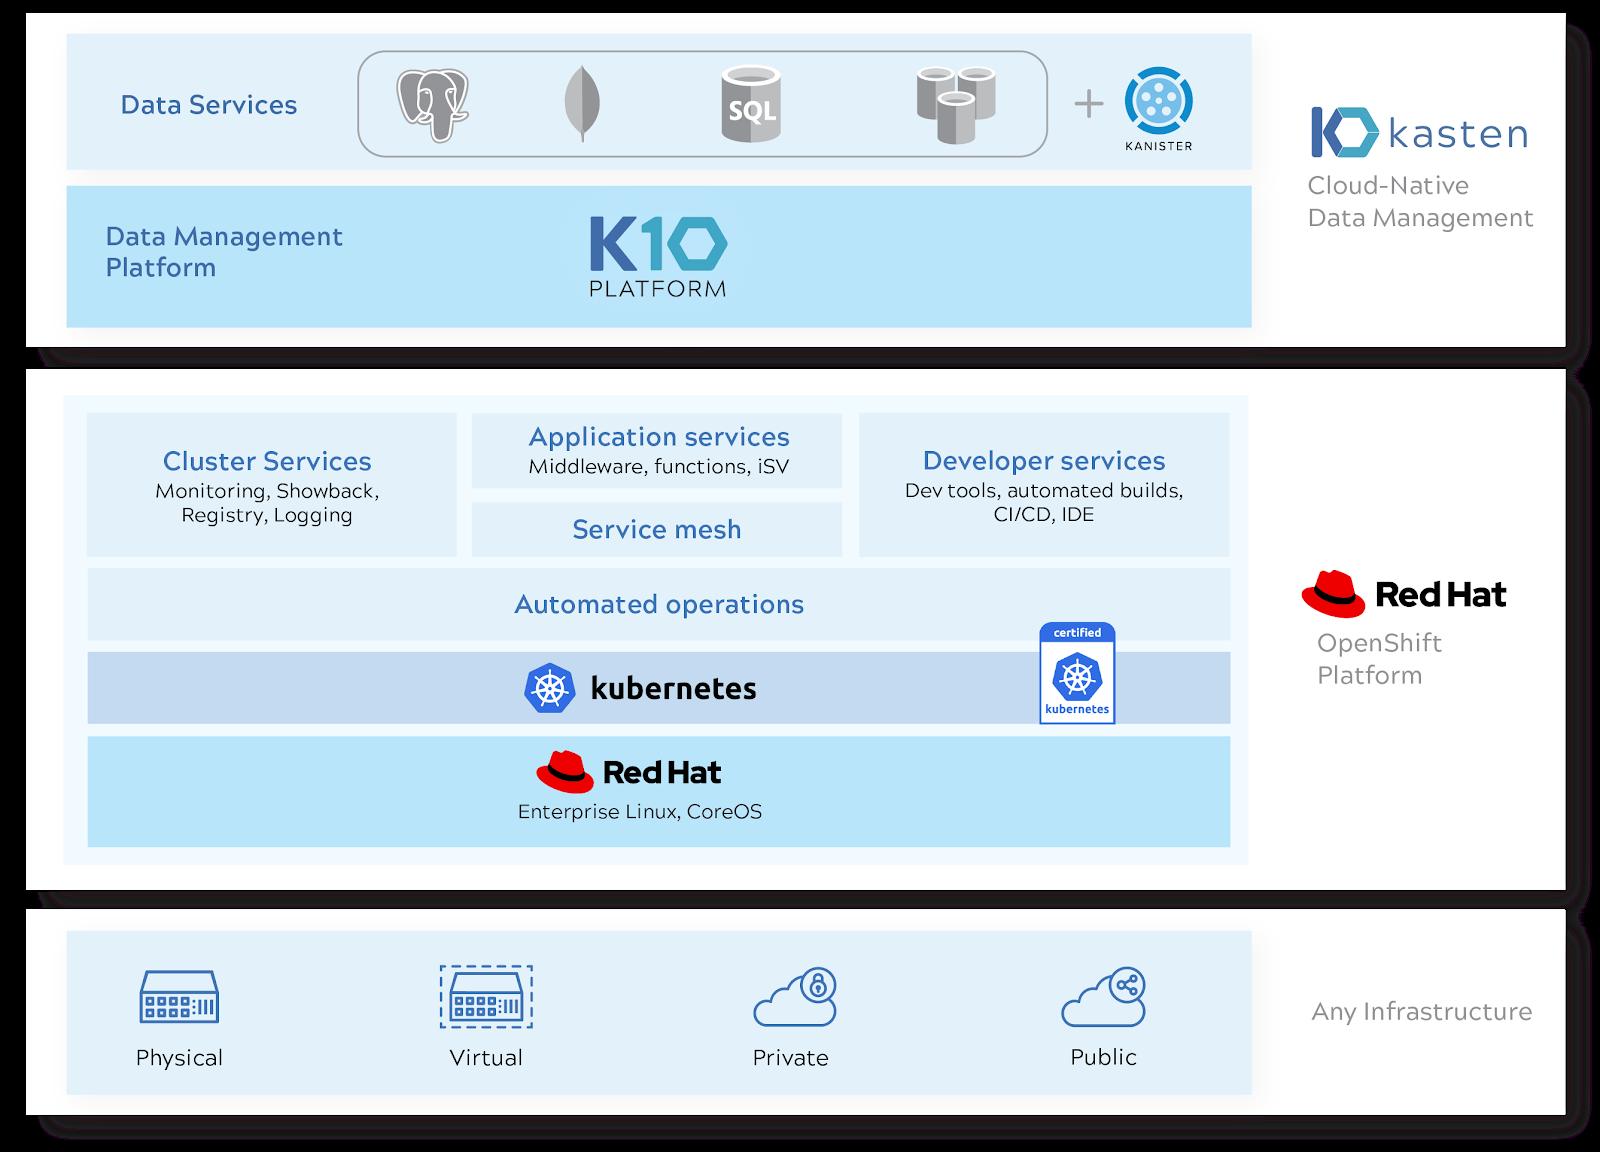 k10-redhat diagram